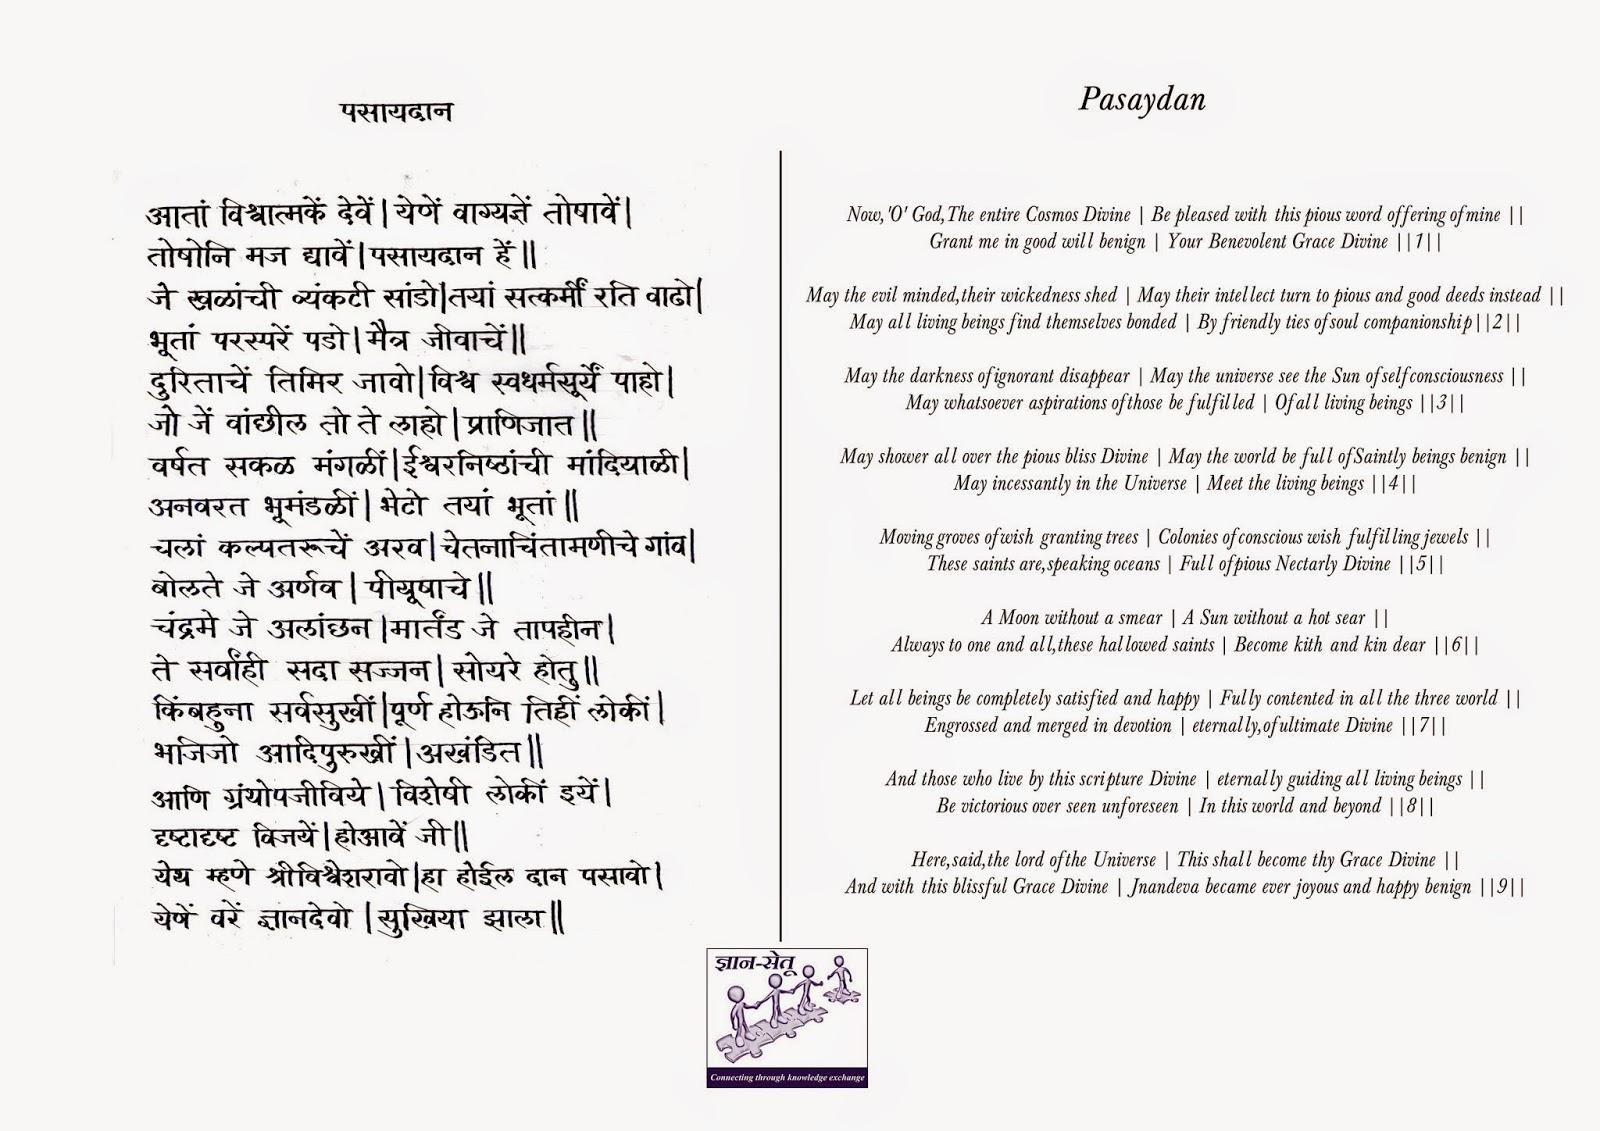 Sant tukaram abhang in english